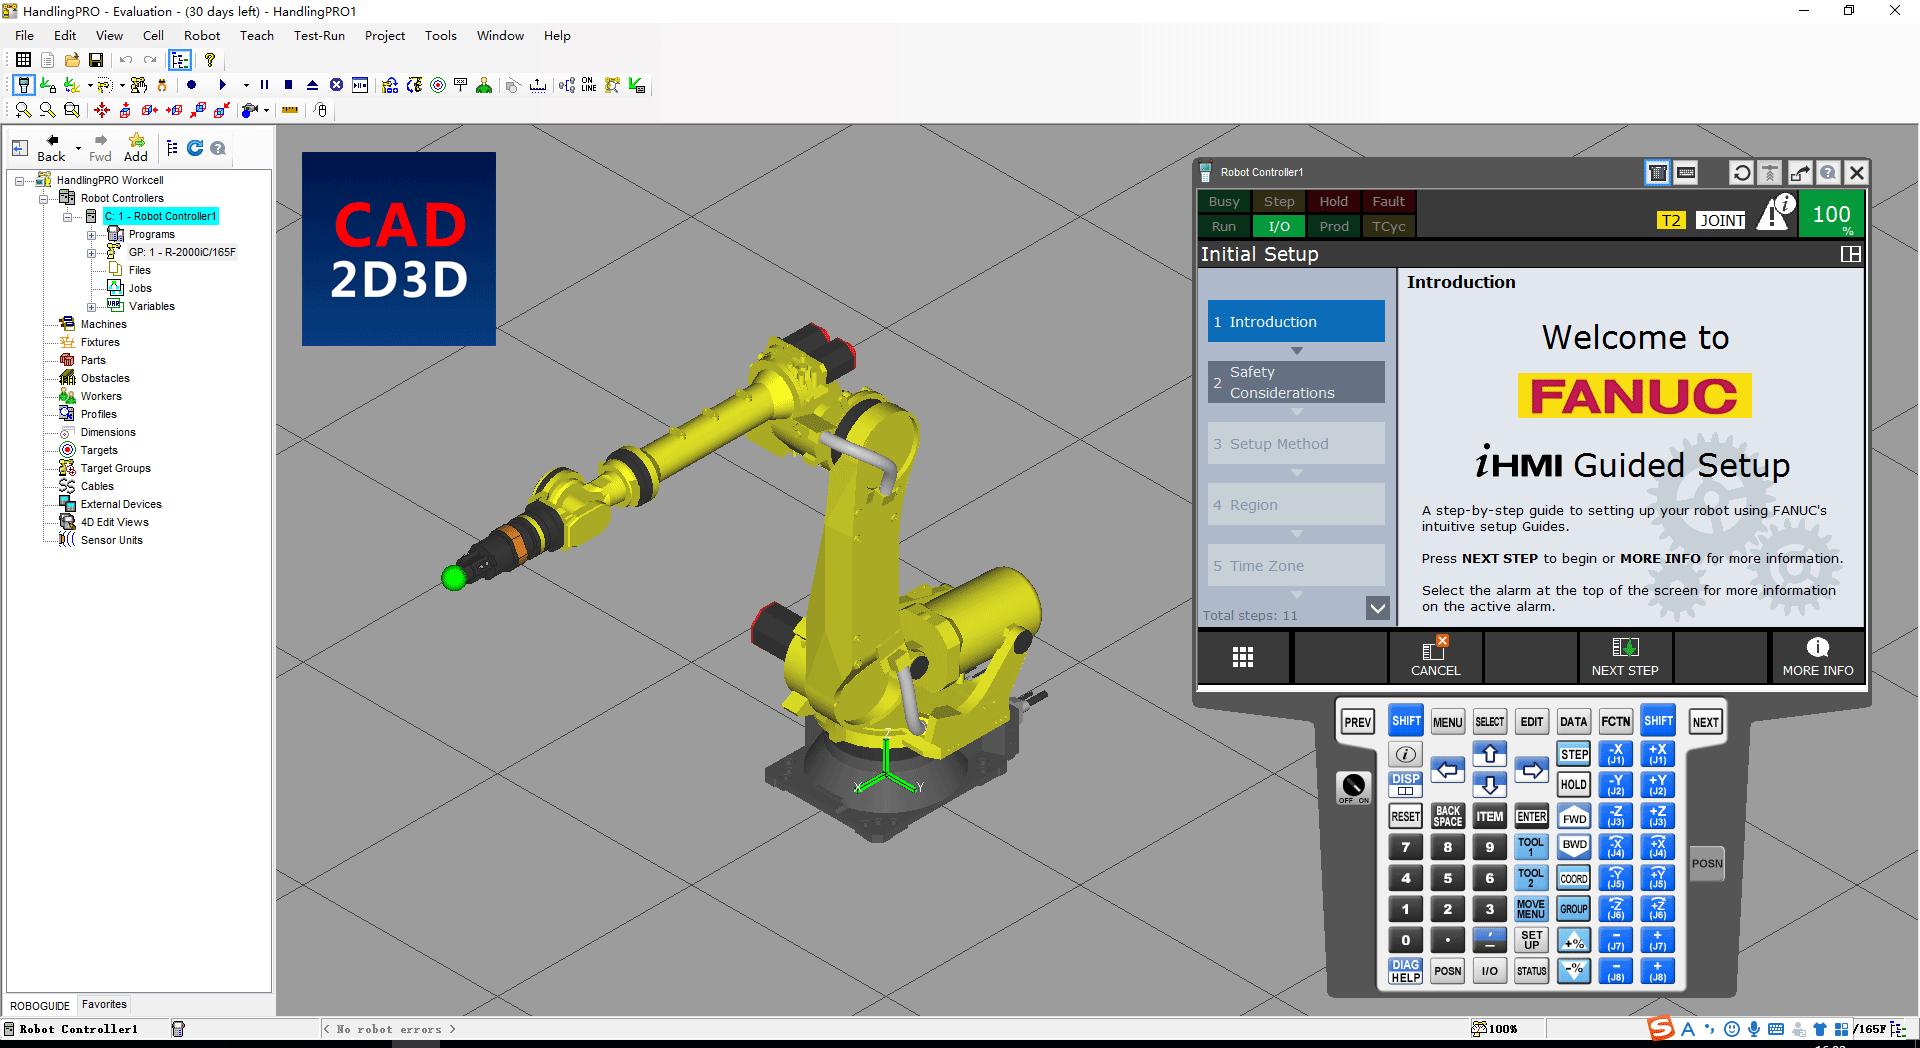 发那科FANUC机器人 ROBOGUIDE 仿真模拟软件操作手册